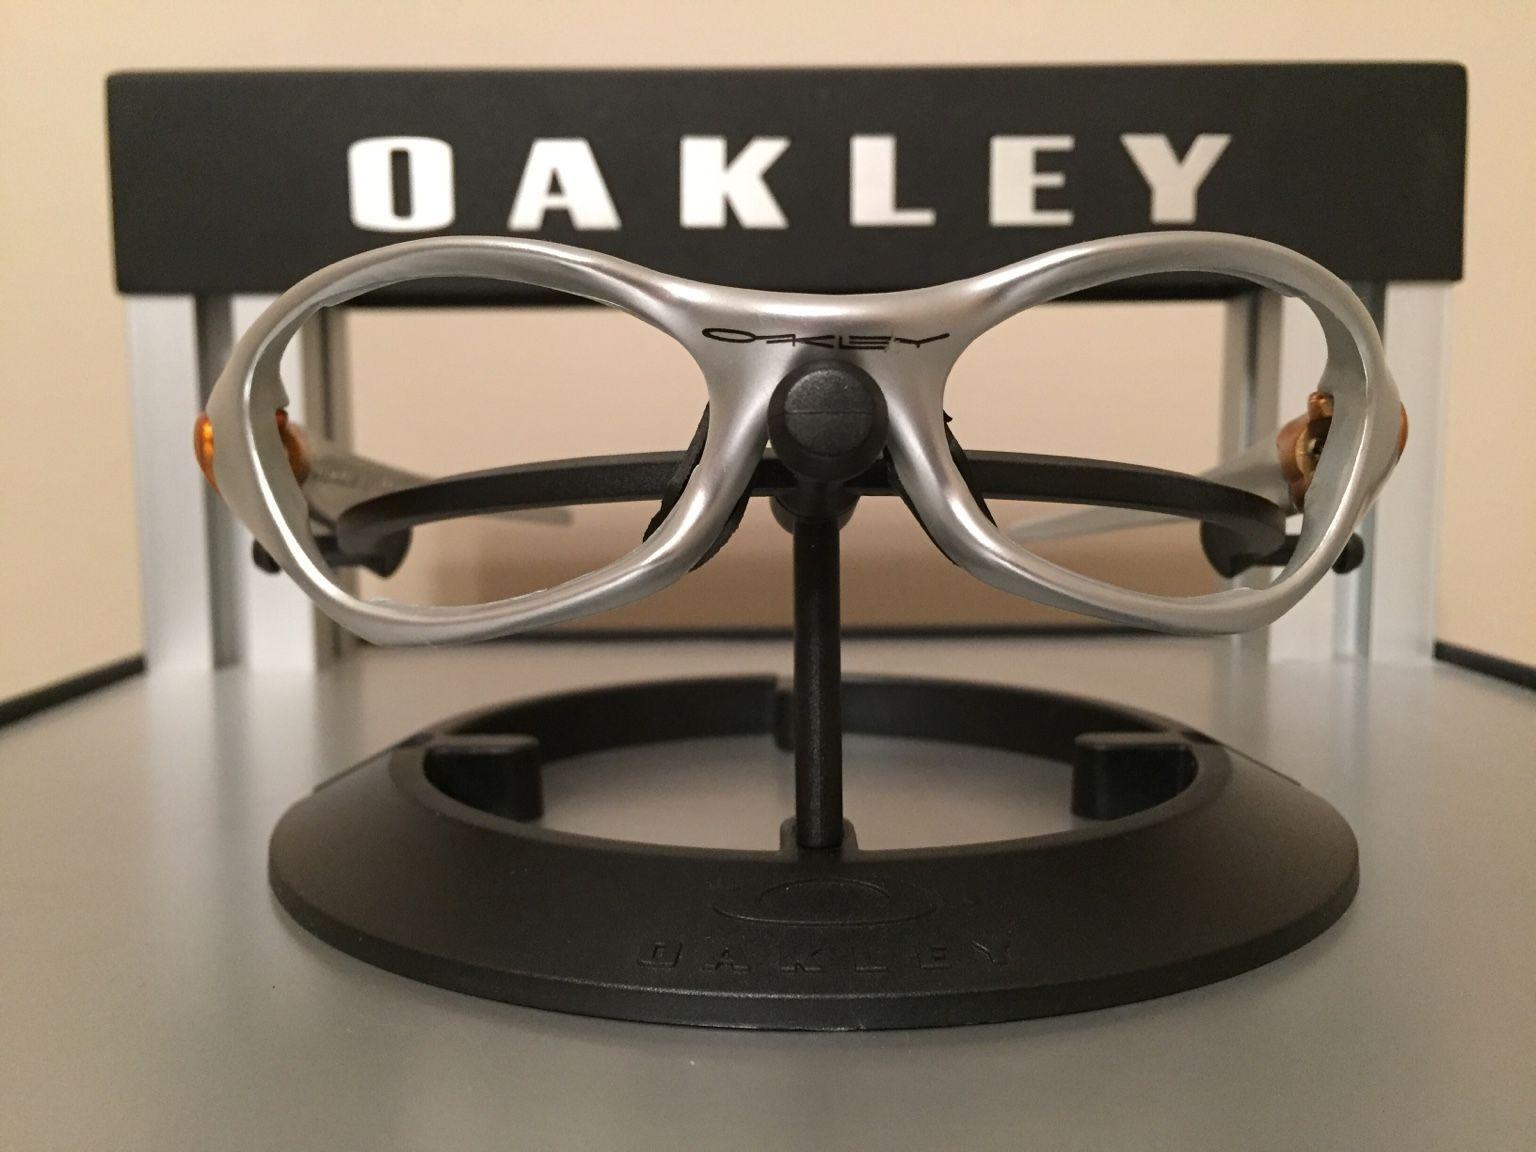 Oakley Valve 1.0 Bundle.......$110 - c287aa1db9b8a564b056a9c3daba17b6.jpg